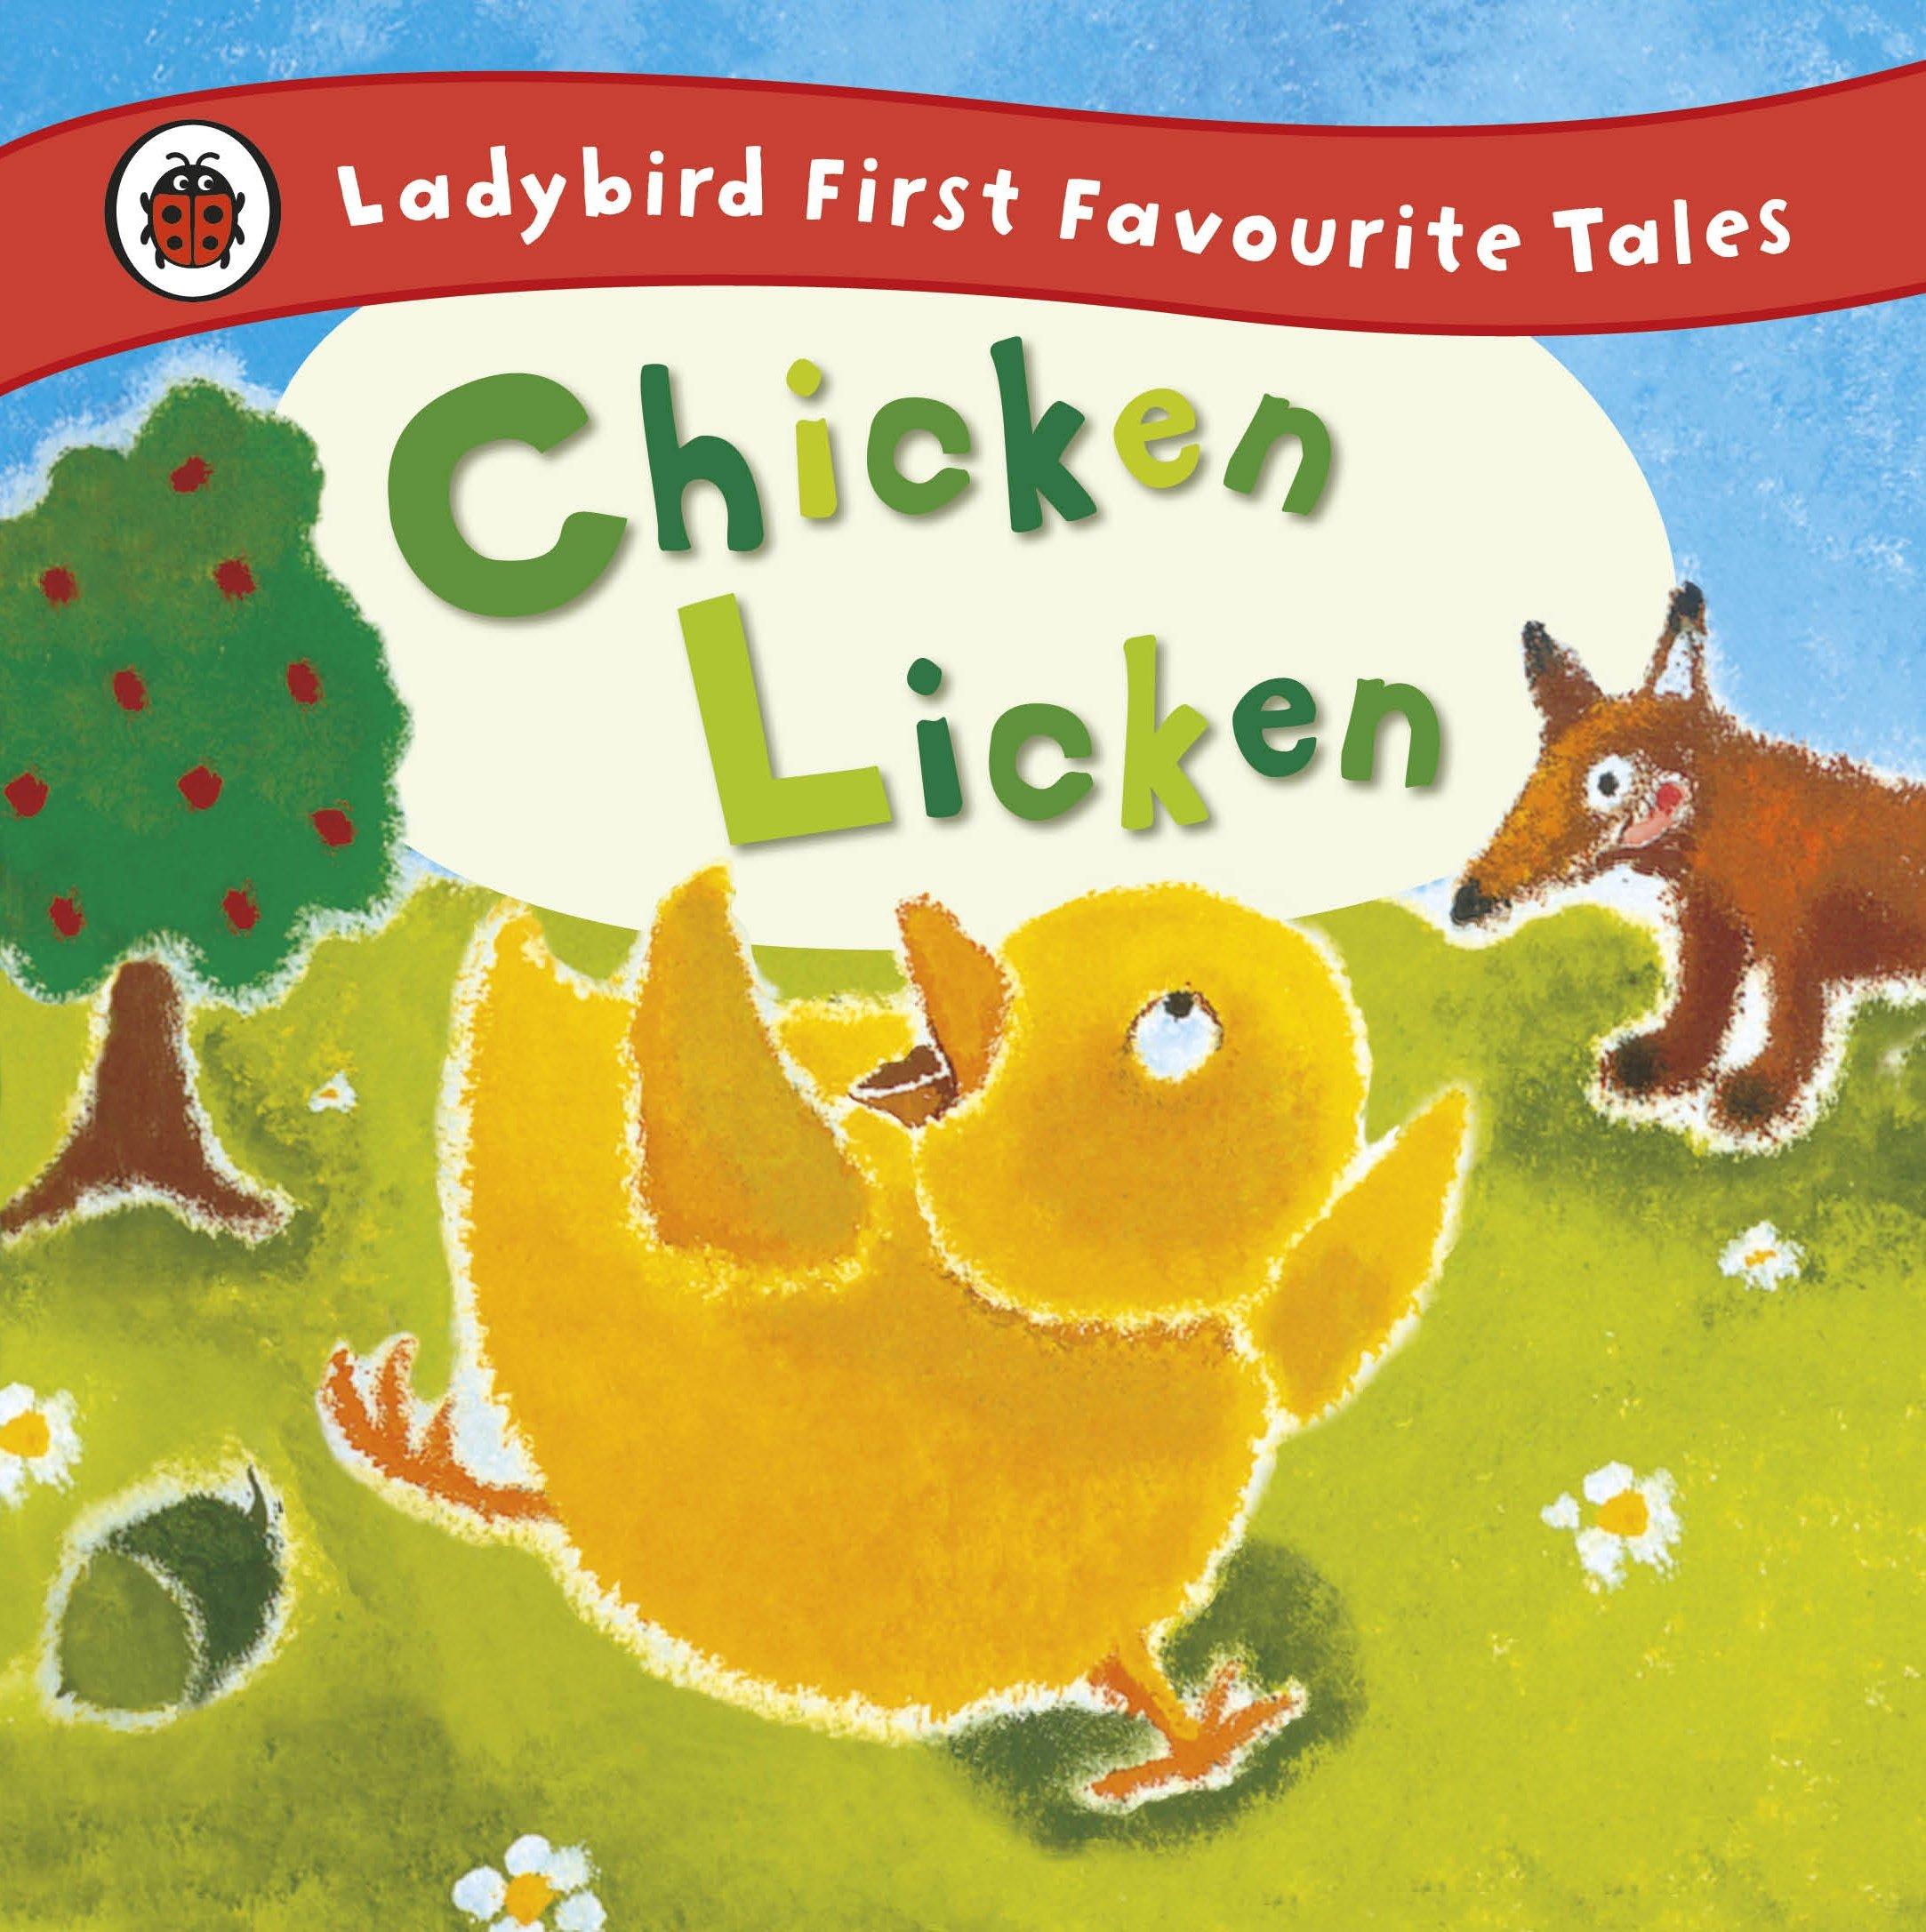 Chicken Licken: Ladybird First Favourite Tales: Amazon.co.uk: Ross, Mandy:  Books